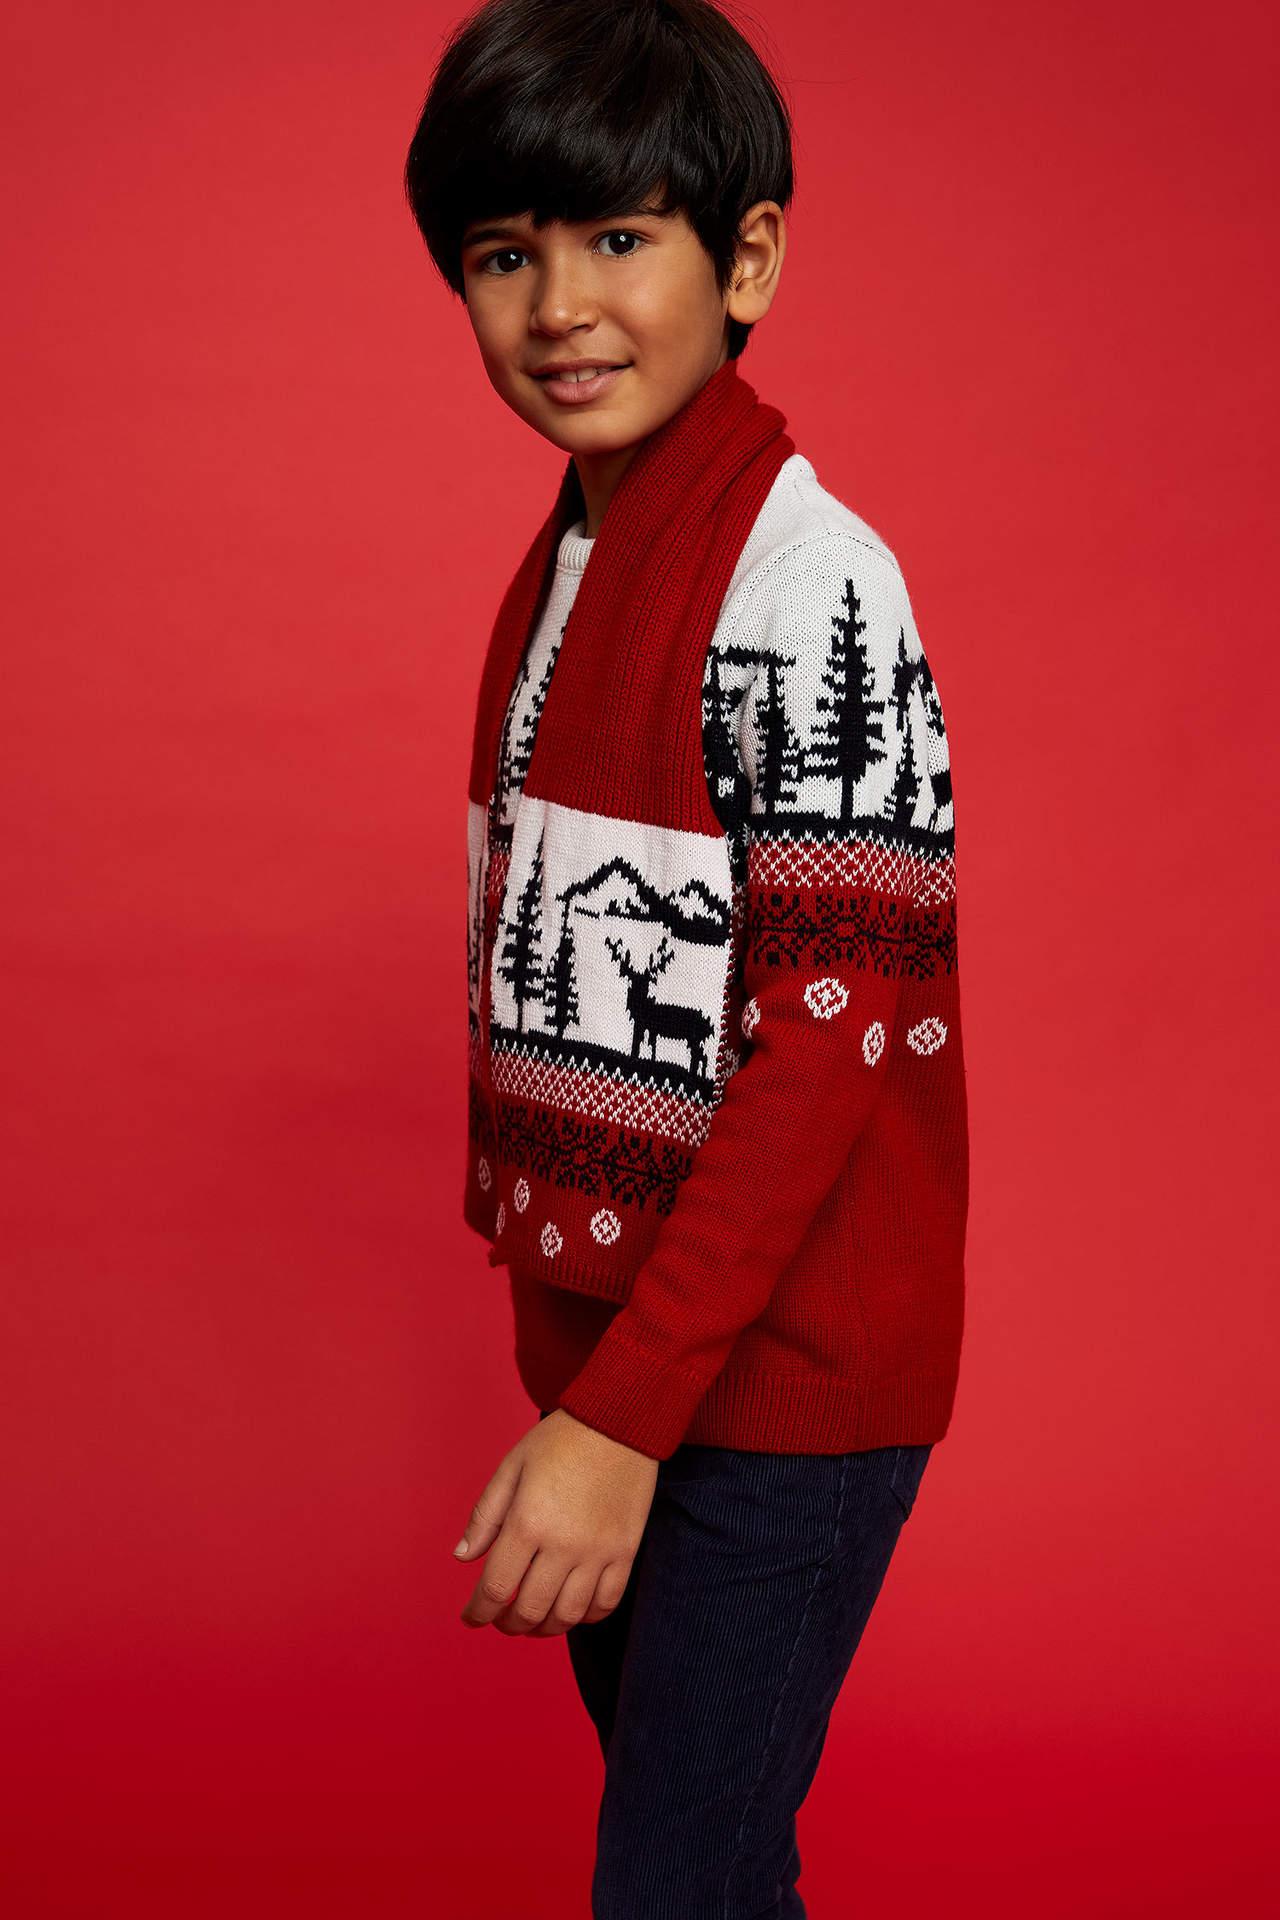 Kids Baby Reindeer Print Knitted Jumper Children Christmas Winter Sweater Top